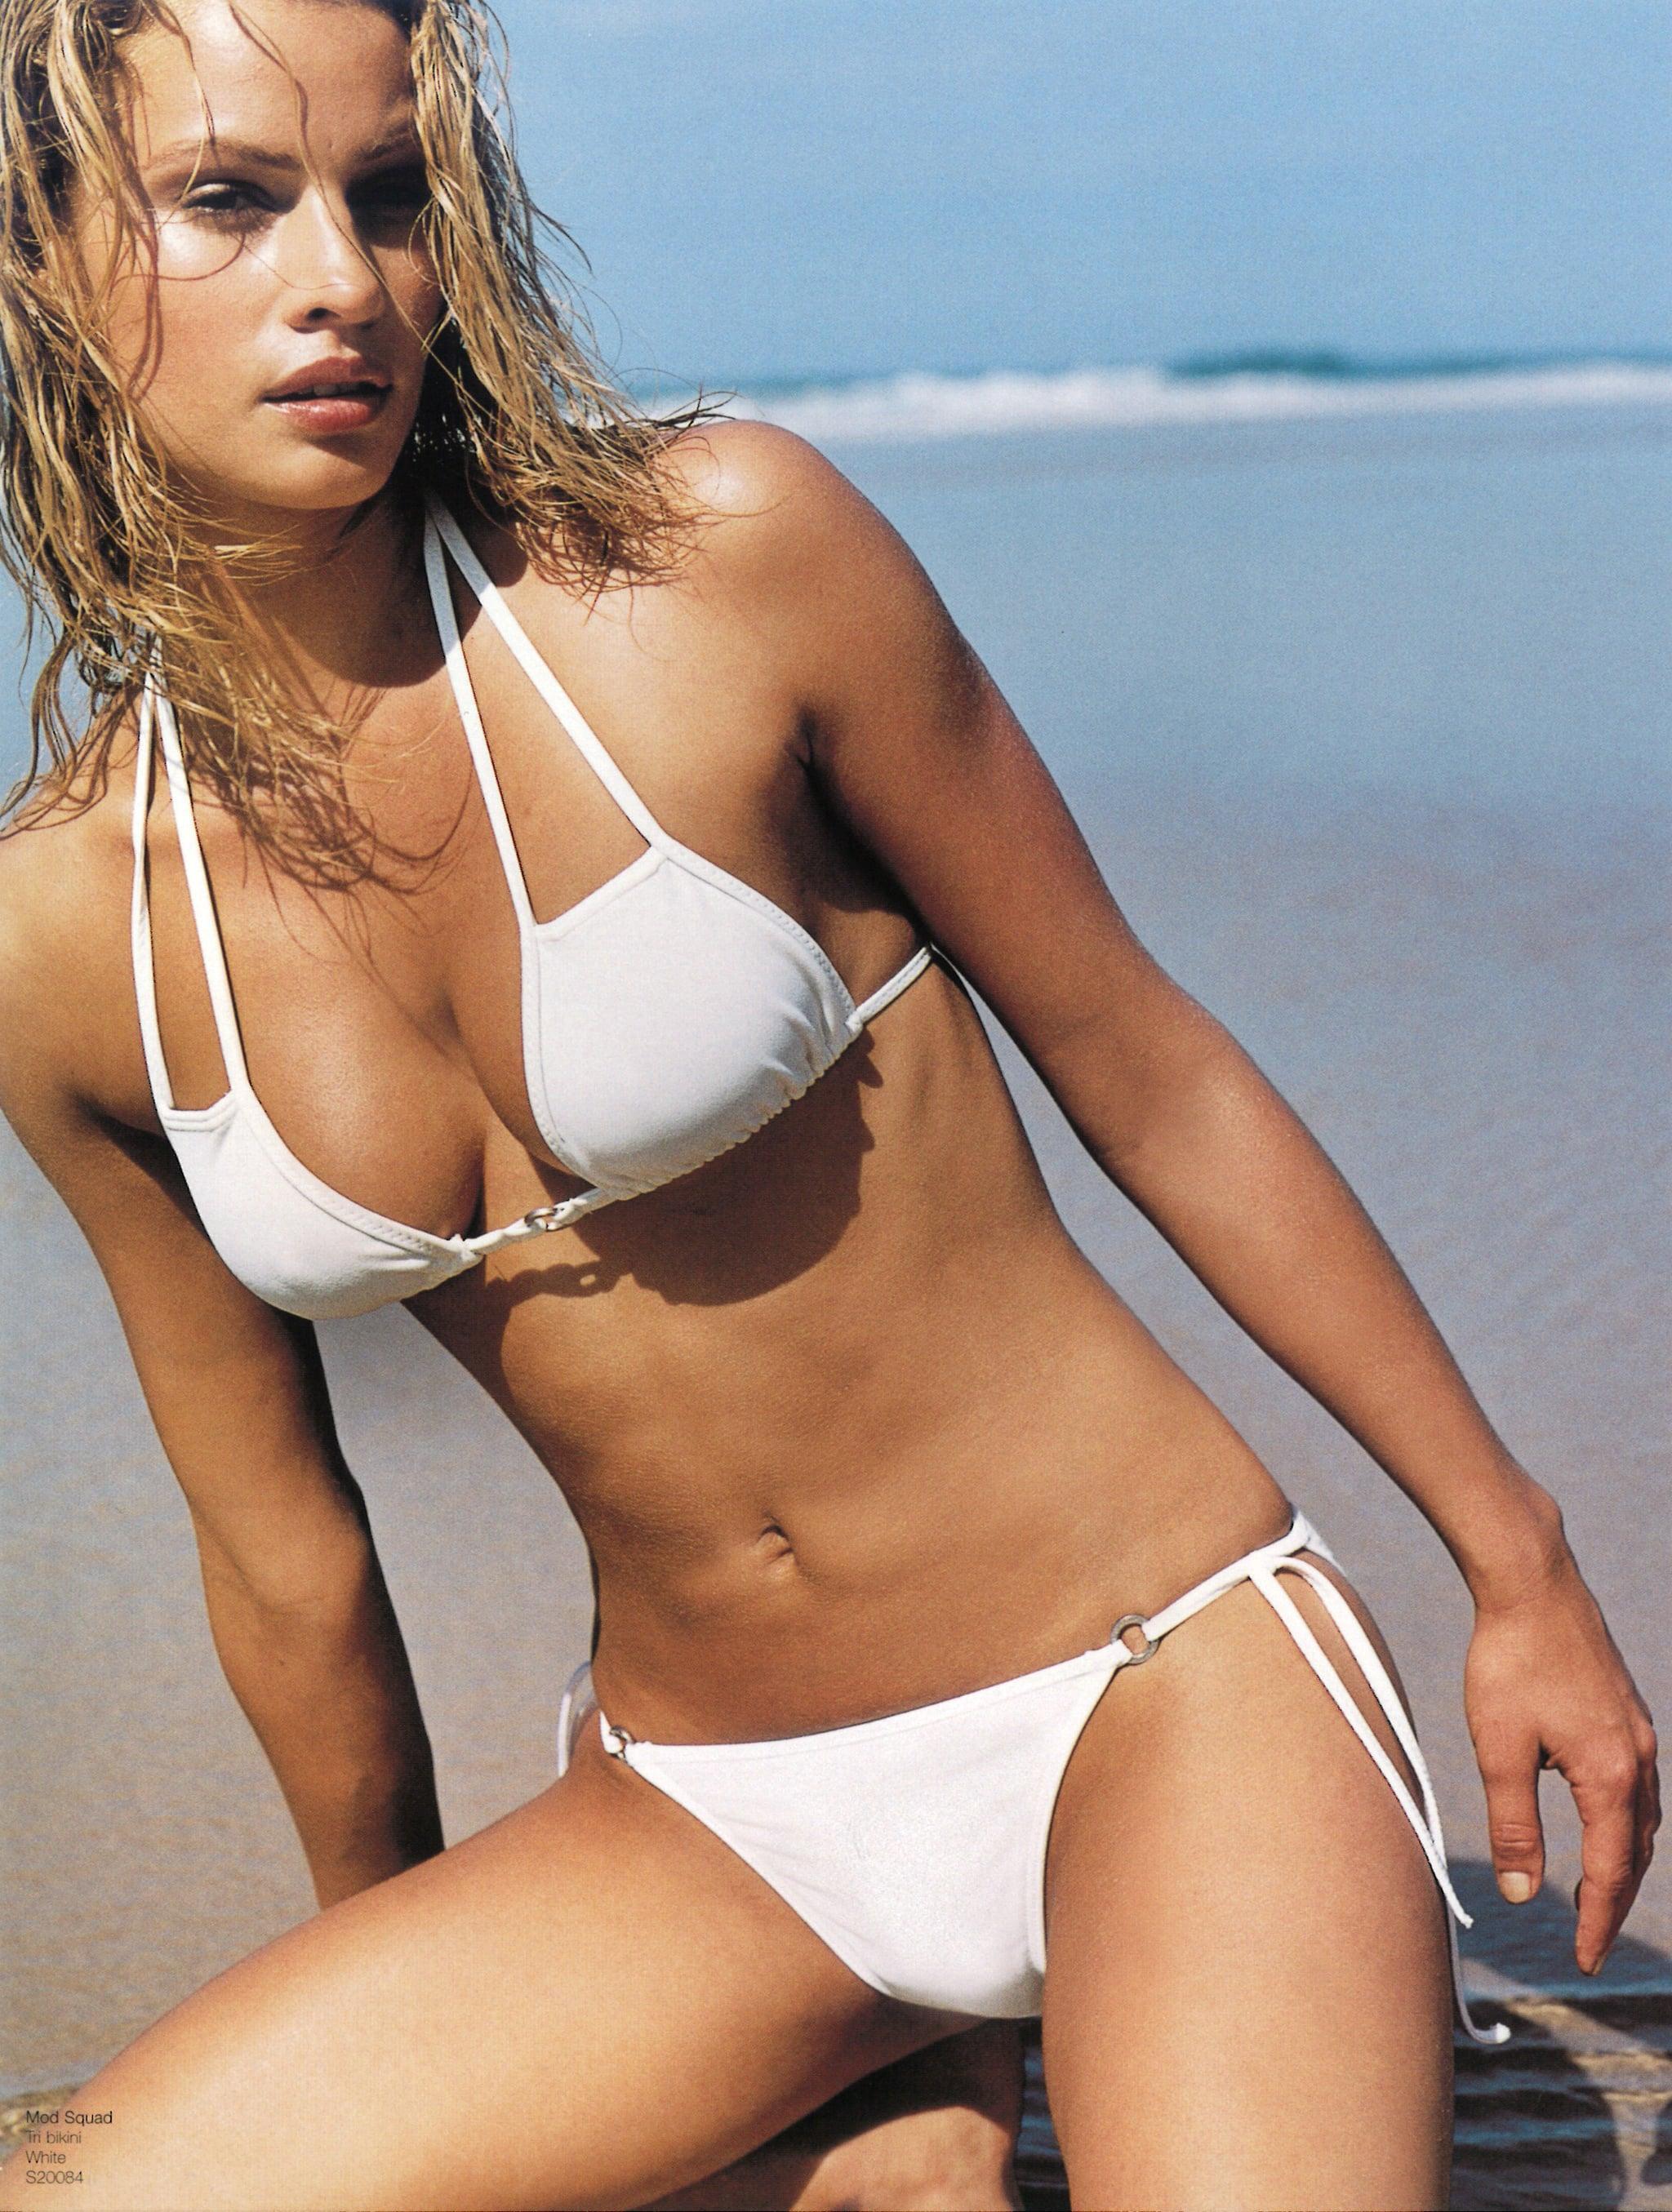 Aussie bikini models